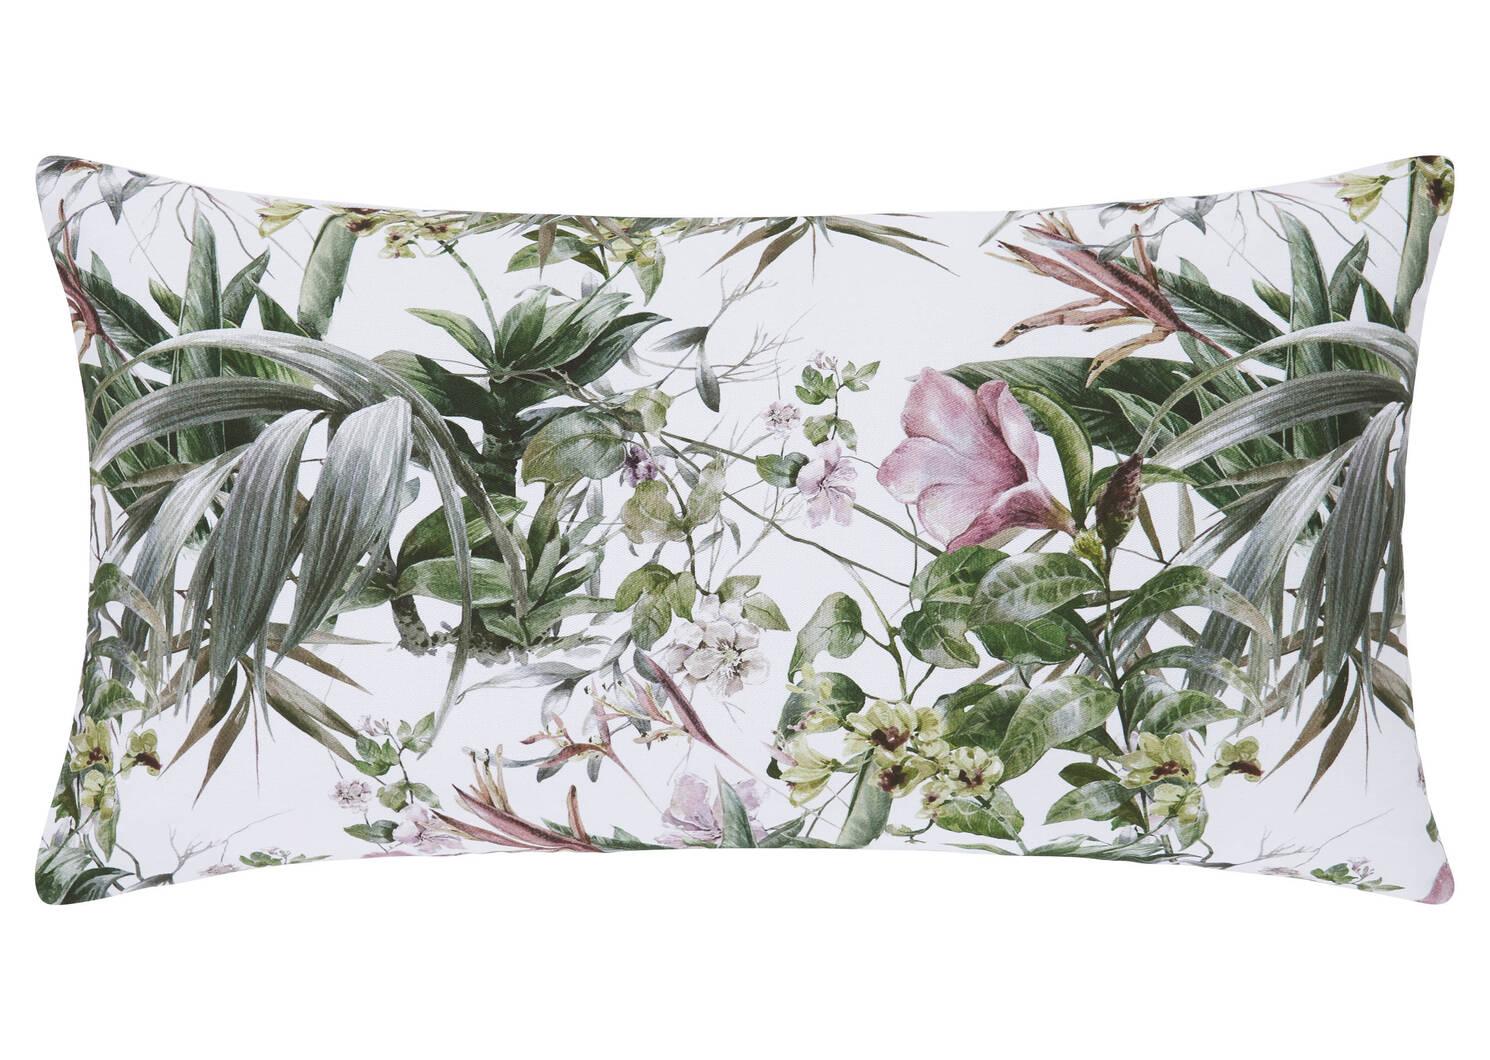 Spirited Floral Toss 12x22 Wht/Sage/P